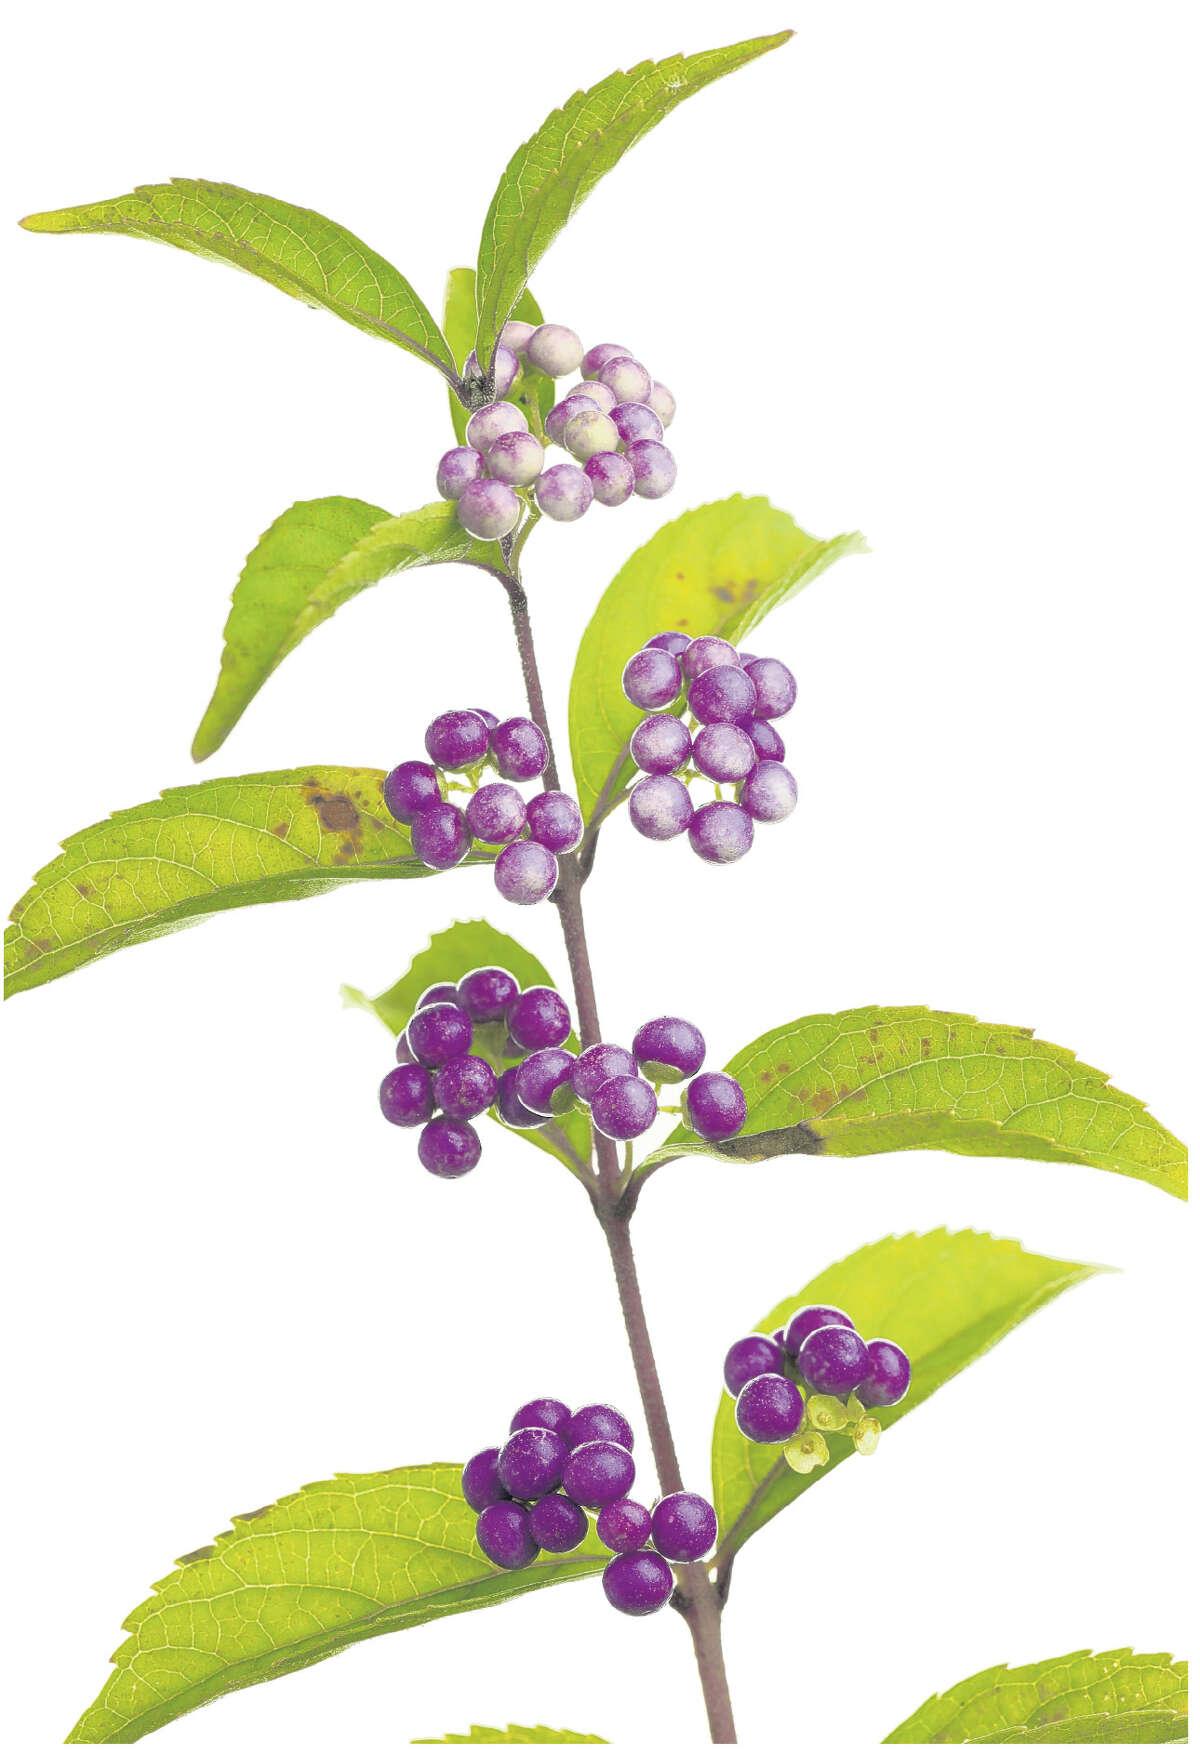 Beautyberry bush (Fotolia.com)